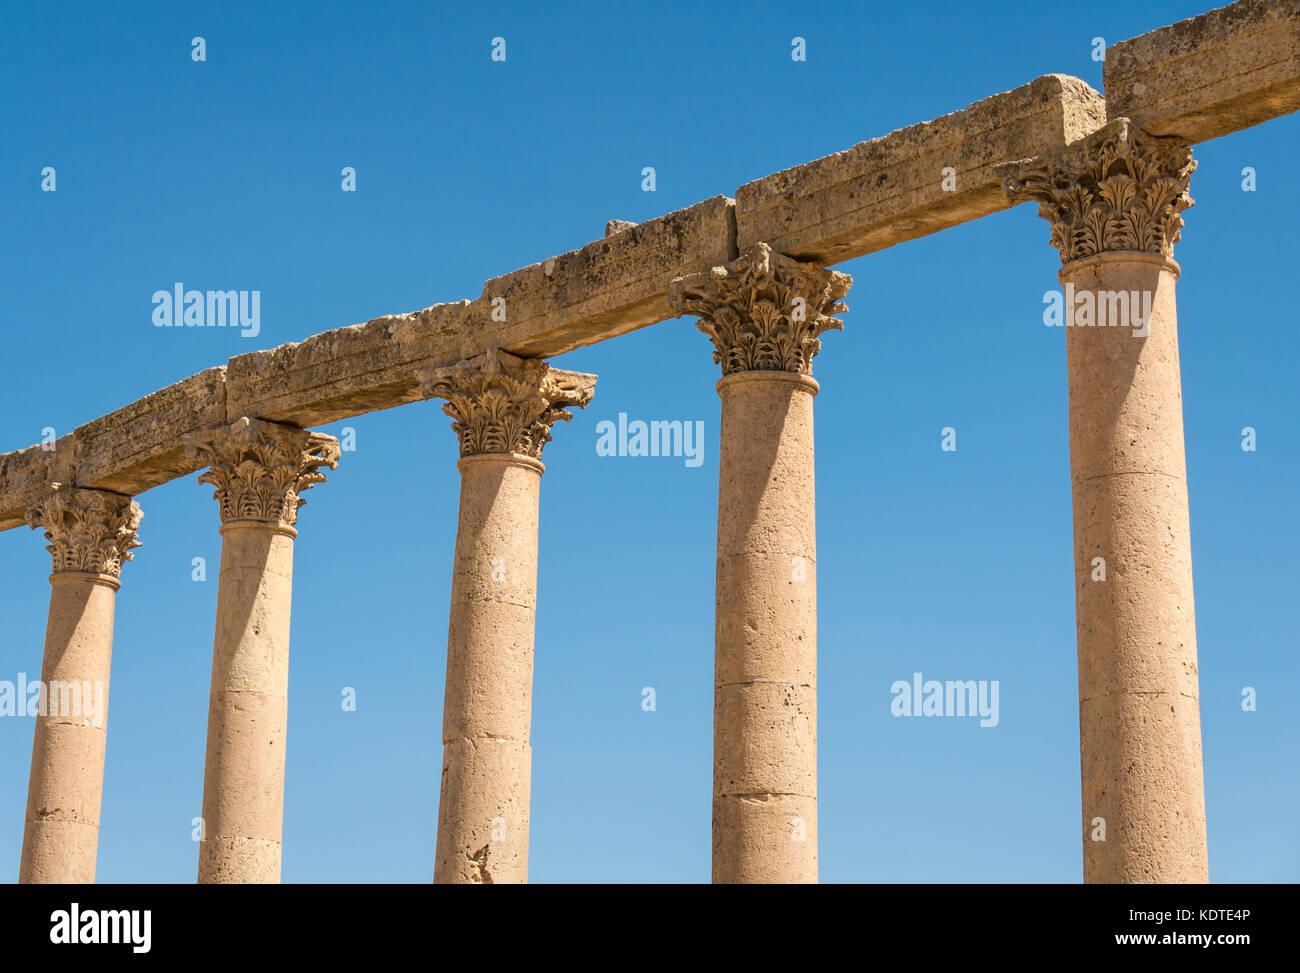 Close up Corinthian columns along the Cardo with acanthus leaf decoration, Roman city of Jerash, archeological site - Stock Image